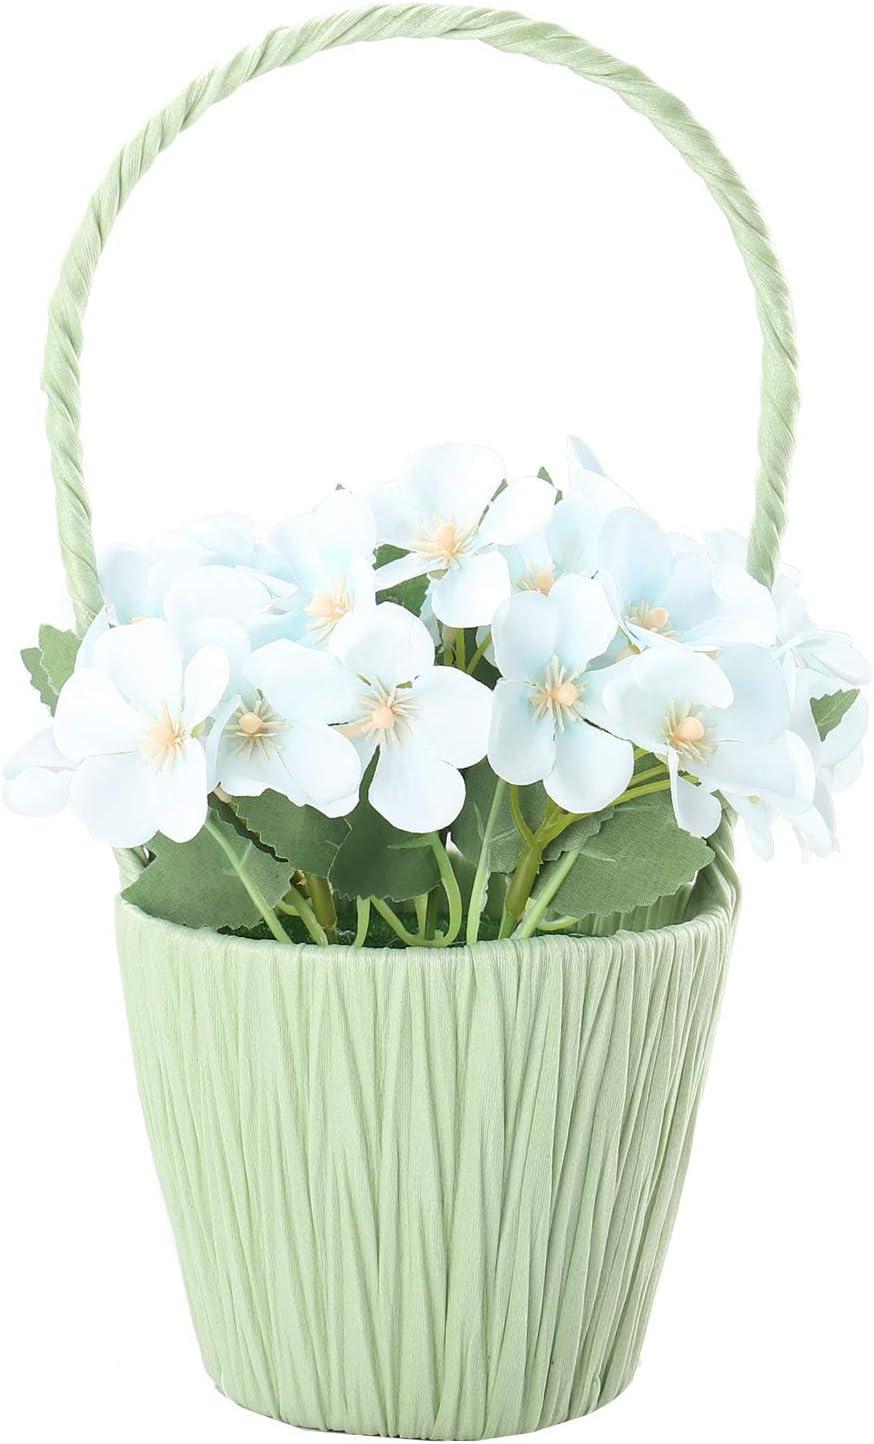 SAROSORA Artificial Begonia Flowers in Hanging Basket - Fake Plants for Birthday Wedding Festival Indoor Home Decoration (Blue, Green Basket)